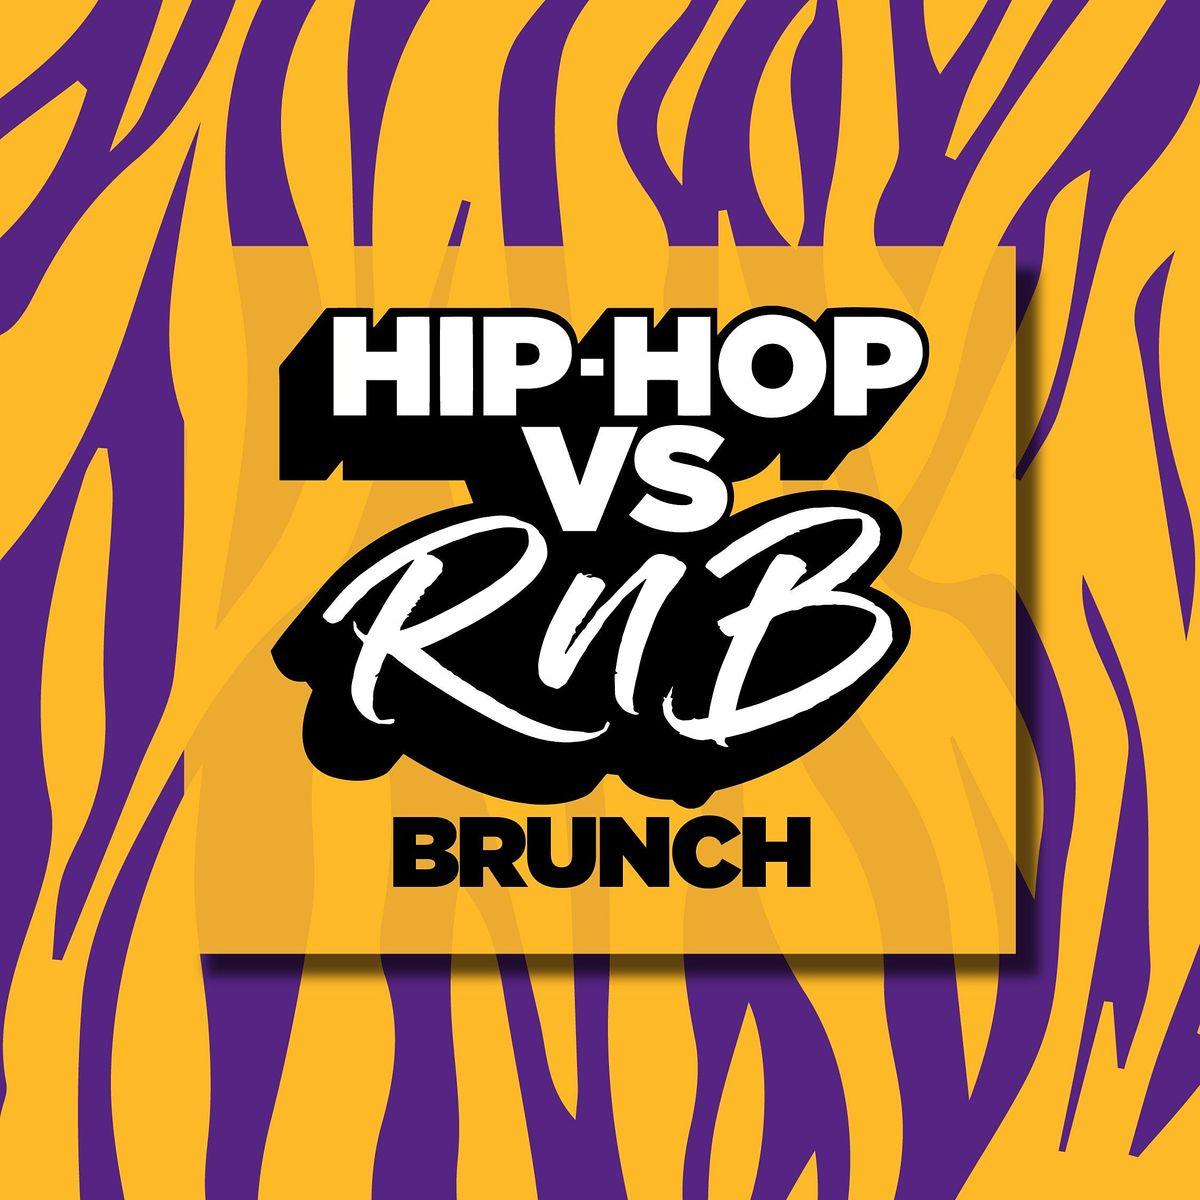 Hip-Hop vs RnB Brunch | Event in London | AllEvents.in